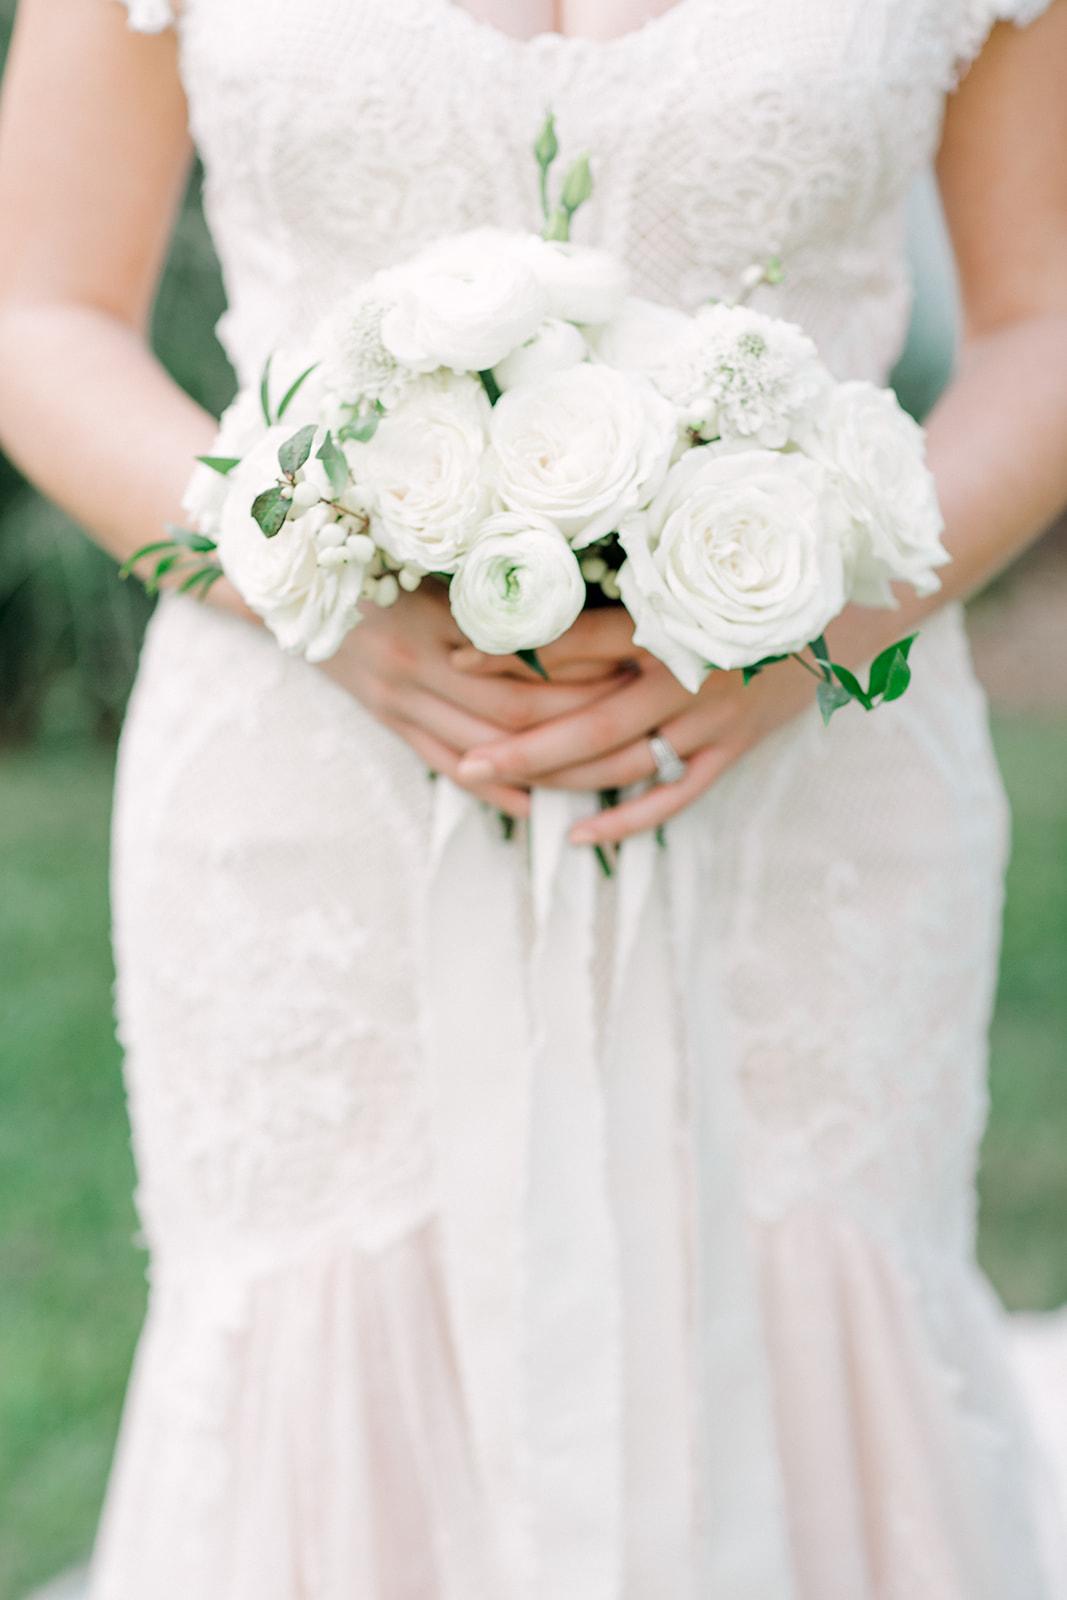 North-Texas-Wedding-Florist-RoseMary-Barn_1723.jpg